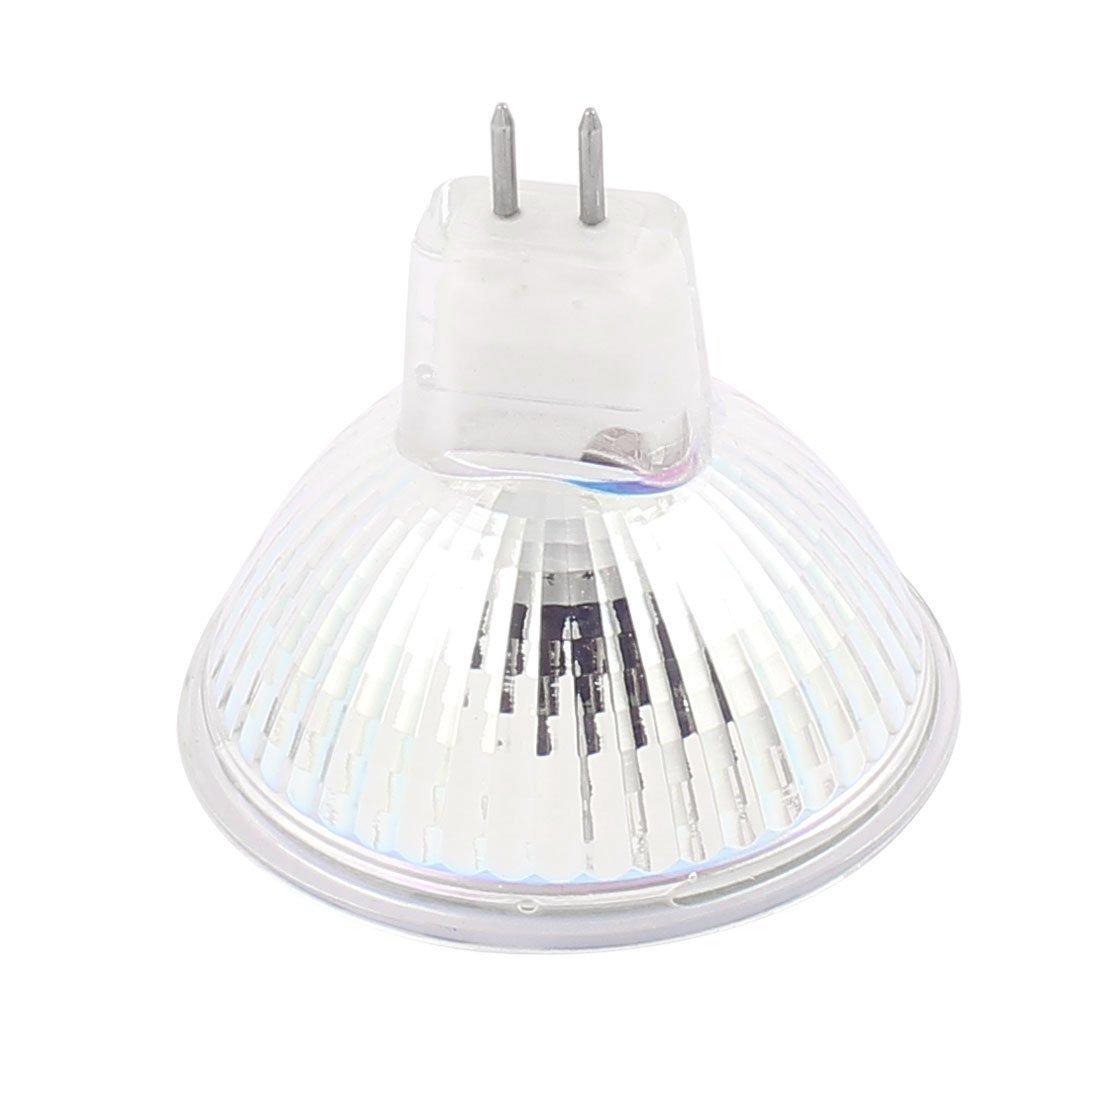 Bombilla eDealMax MR16 29LEDs SMD5050 5W de cristal lámpara ahorro de energía LED calienta 110V blanco de la CA - - Amazon.com